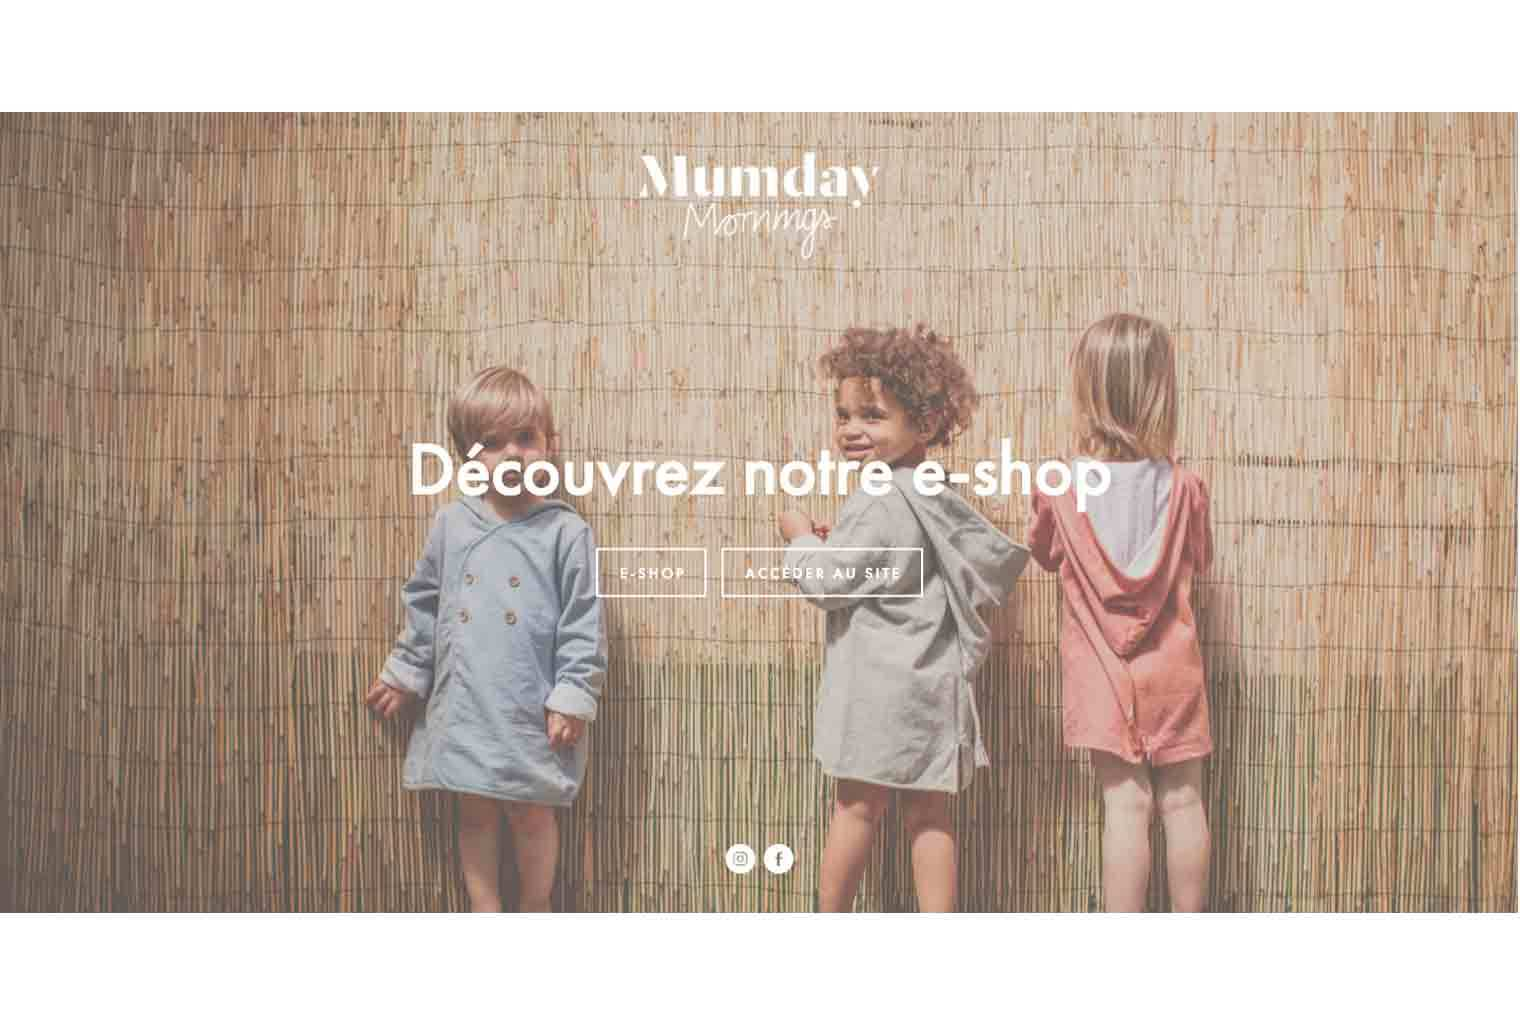 2017-05-Mumday.jpg